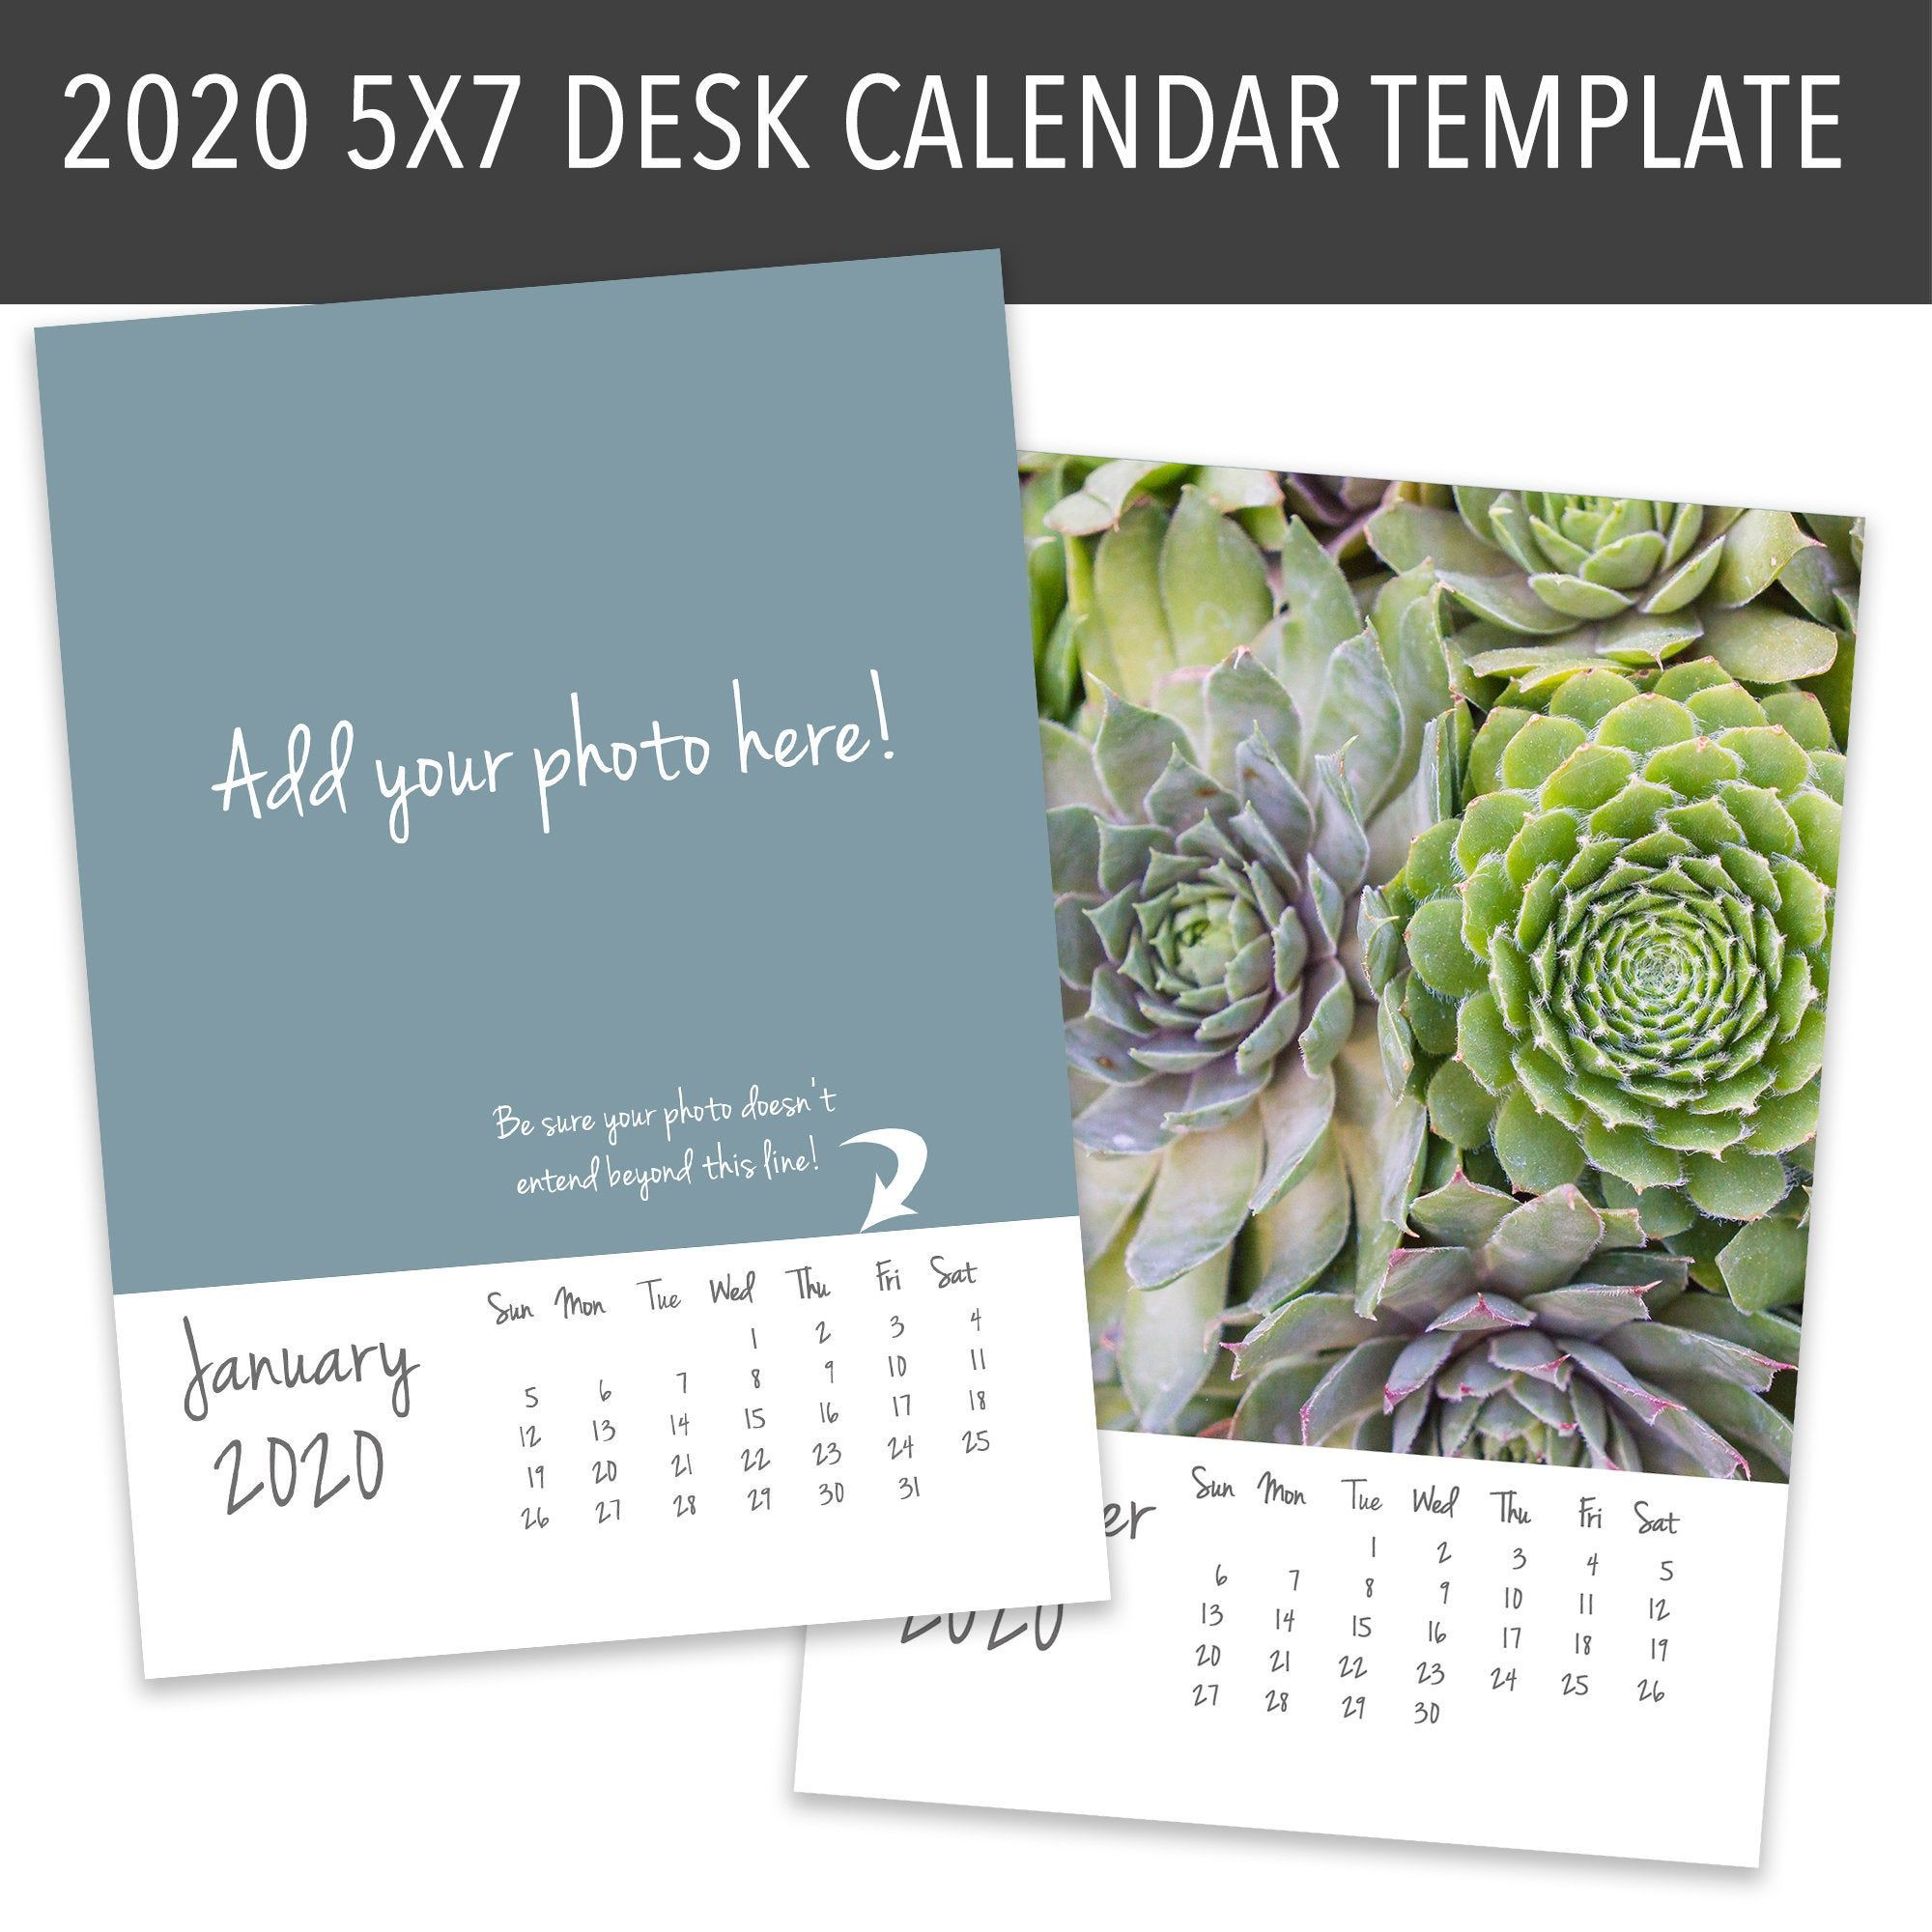 5x7 2020 Desk Calendar Template Instant Download Diy